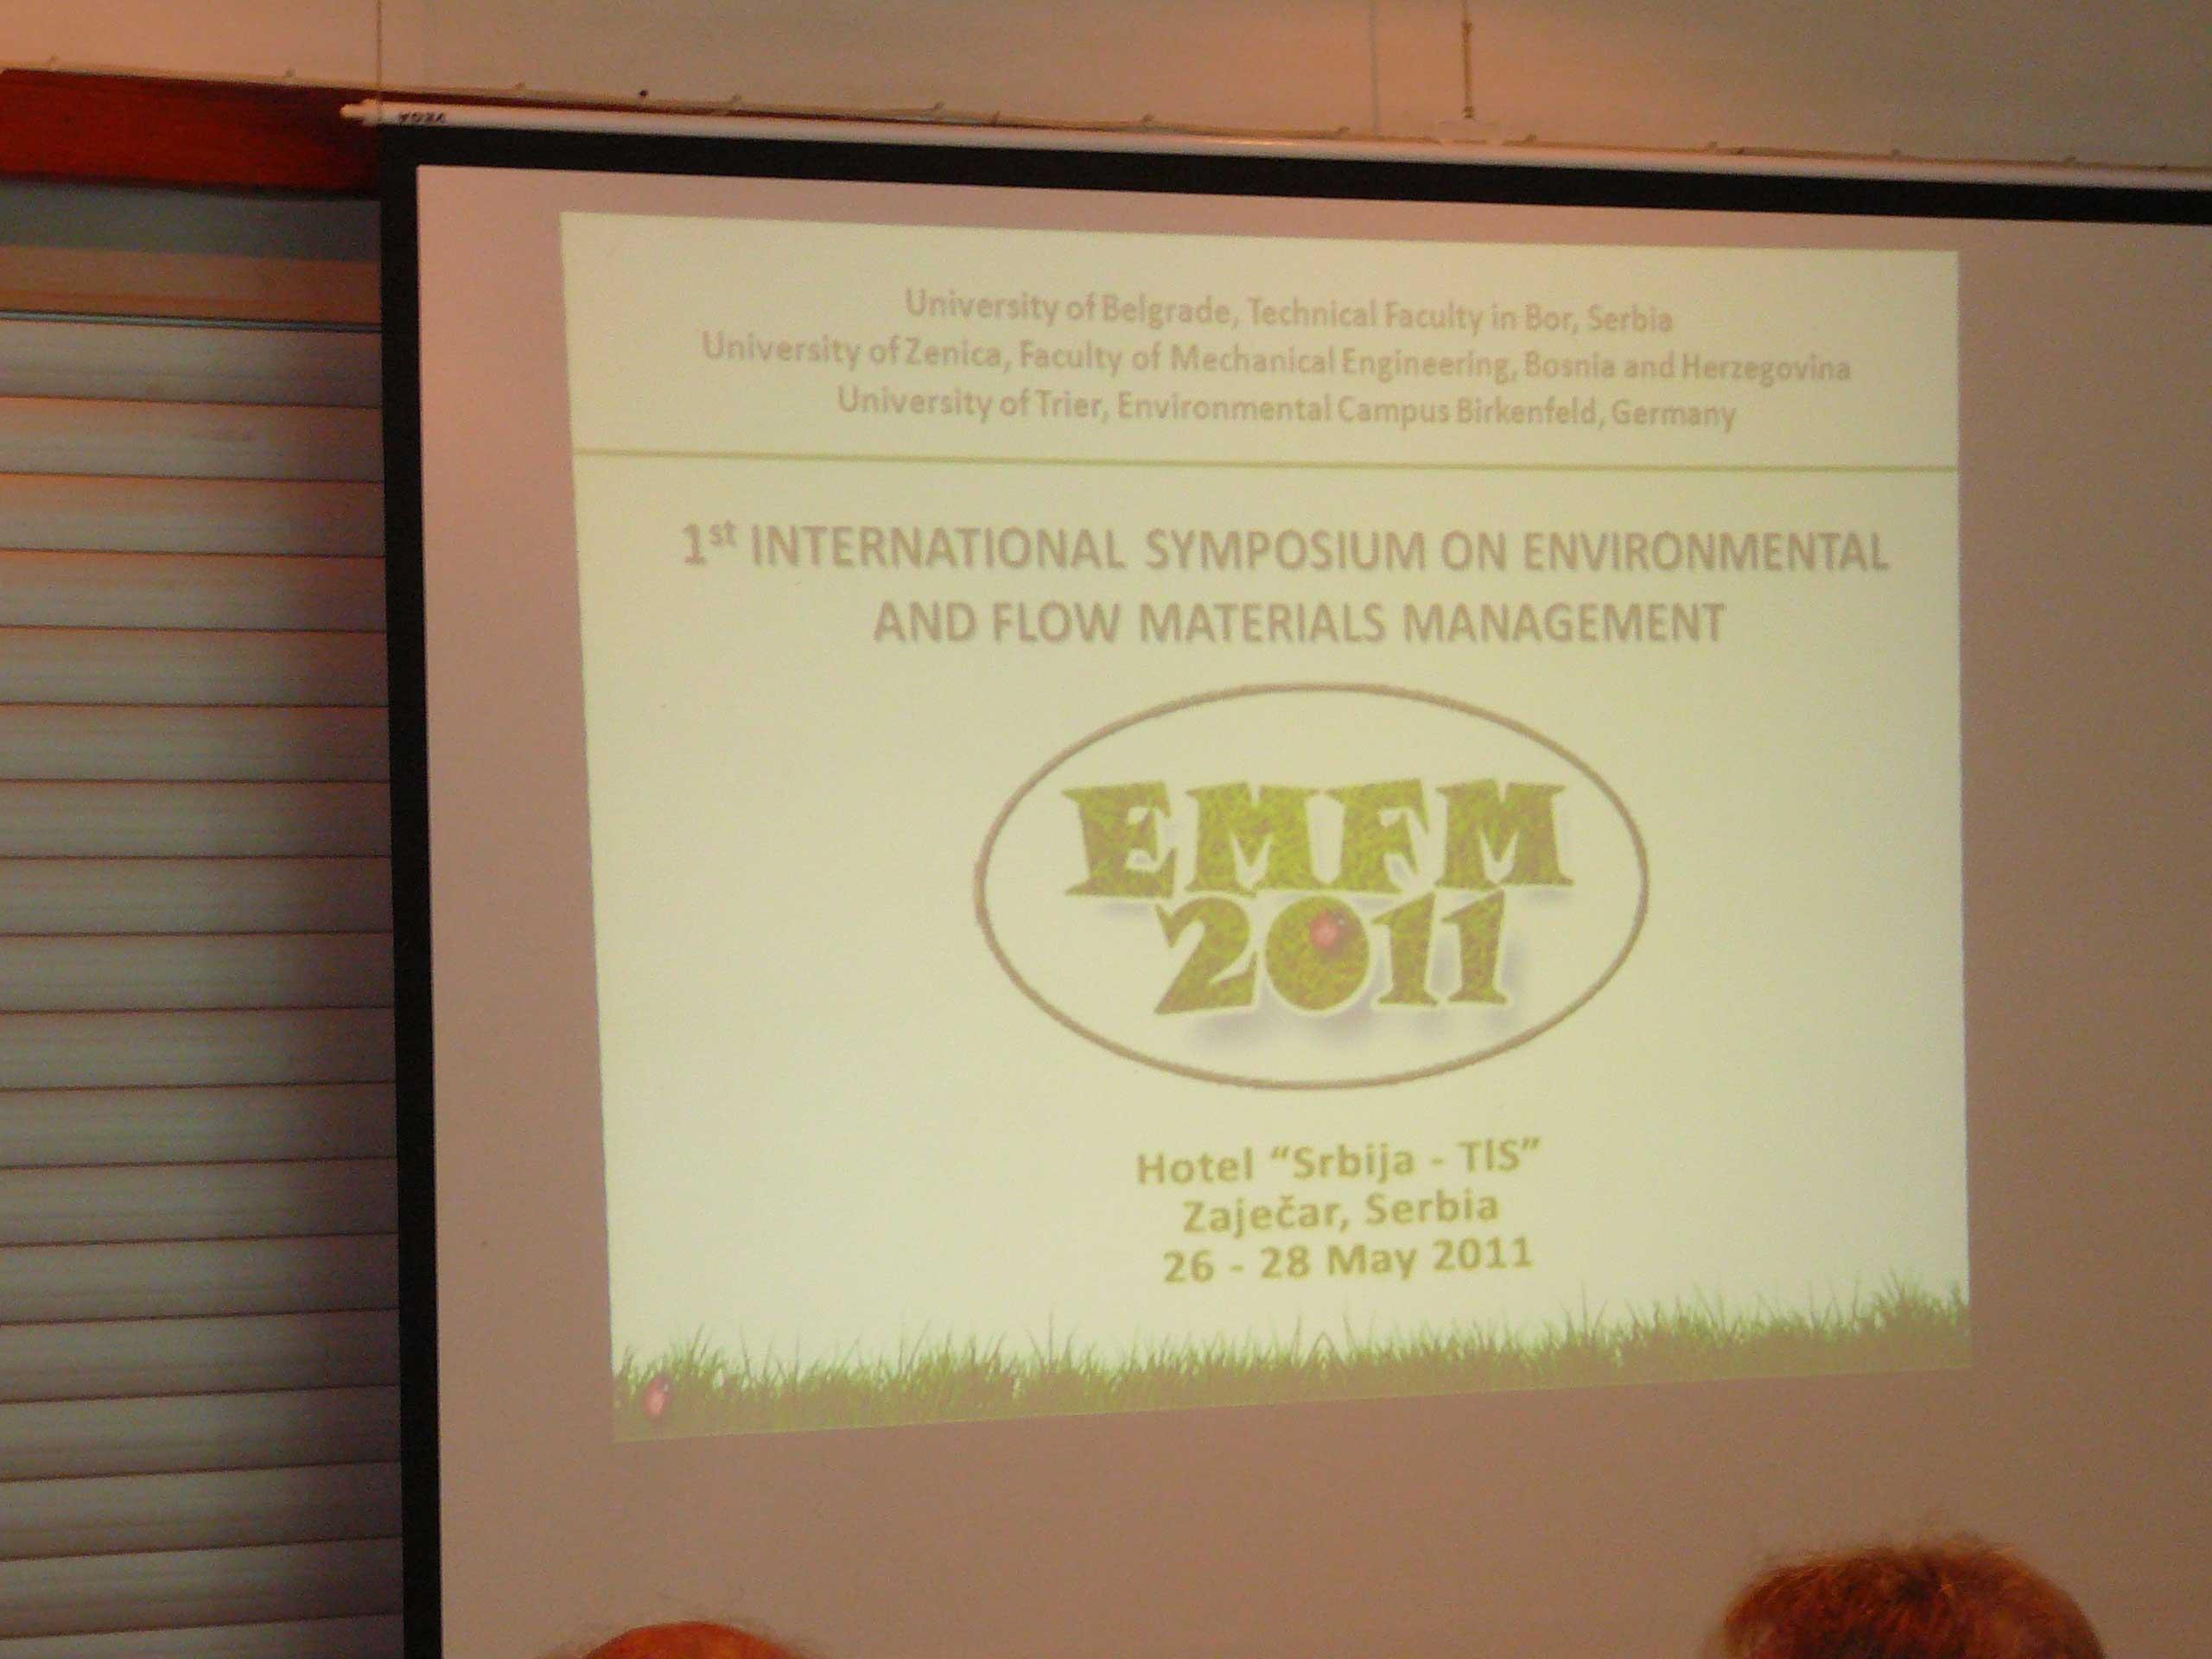 MKSM2011 i EMFM2011